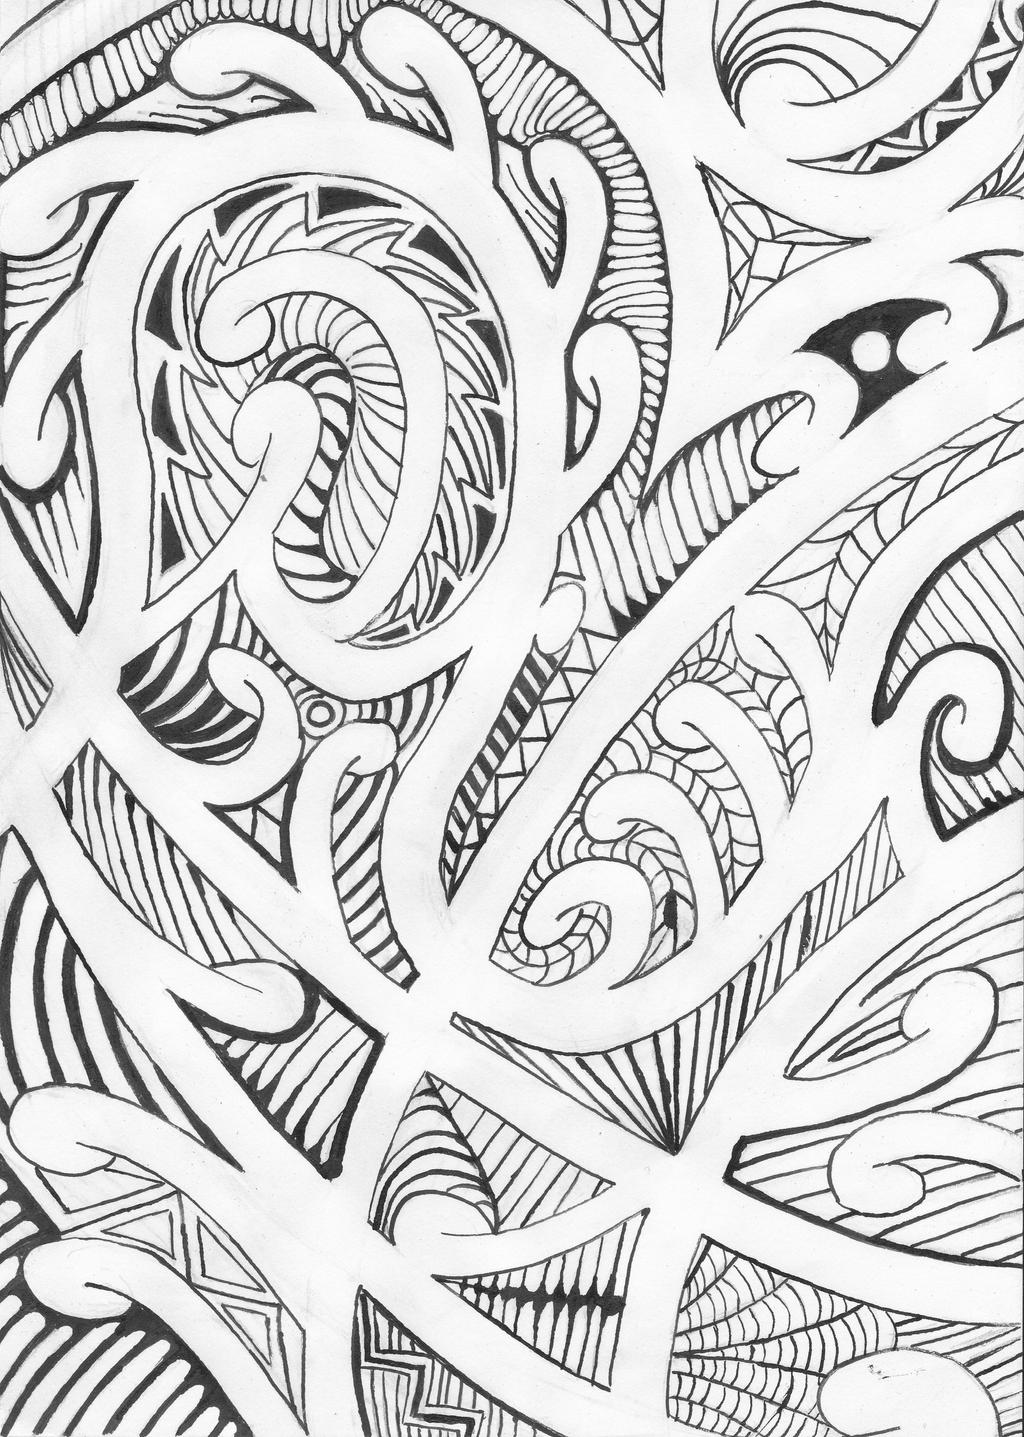 maori art iphone wallpaper - photo #8